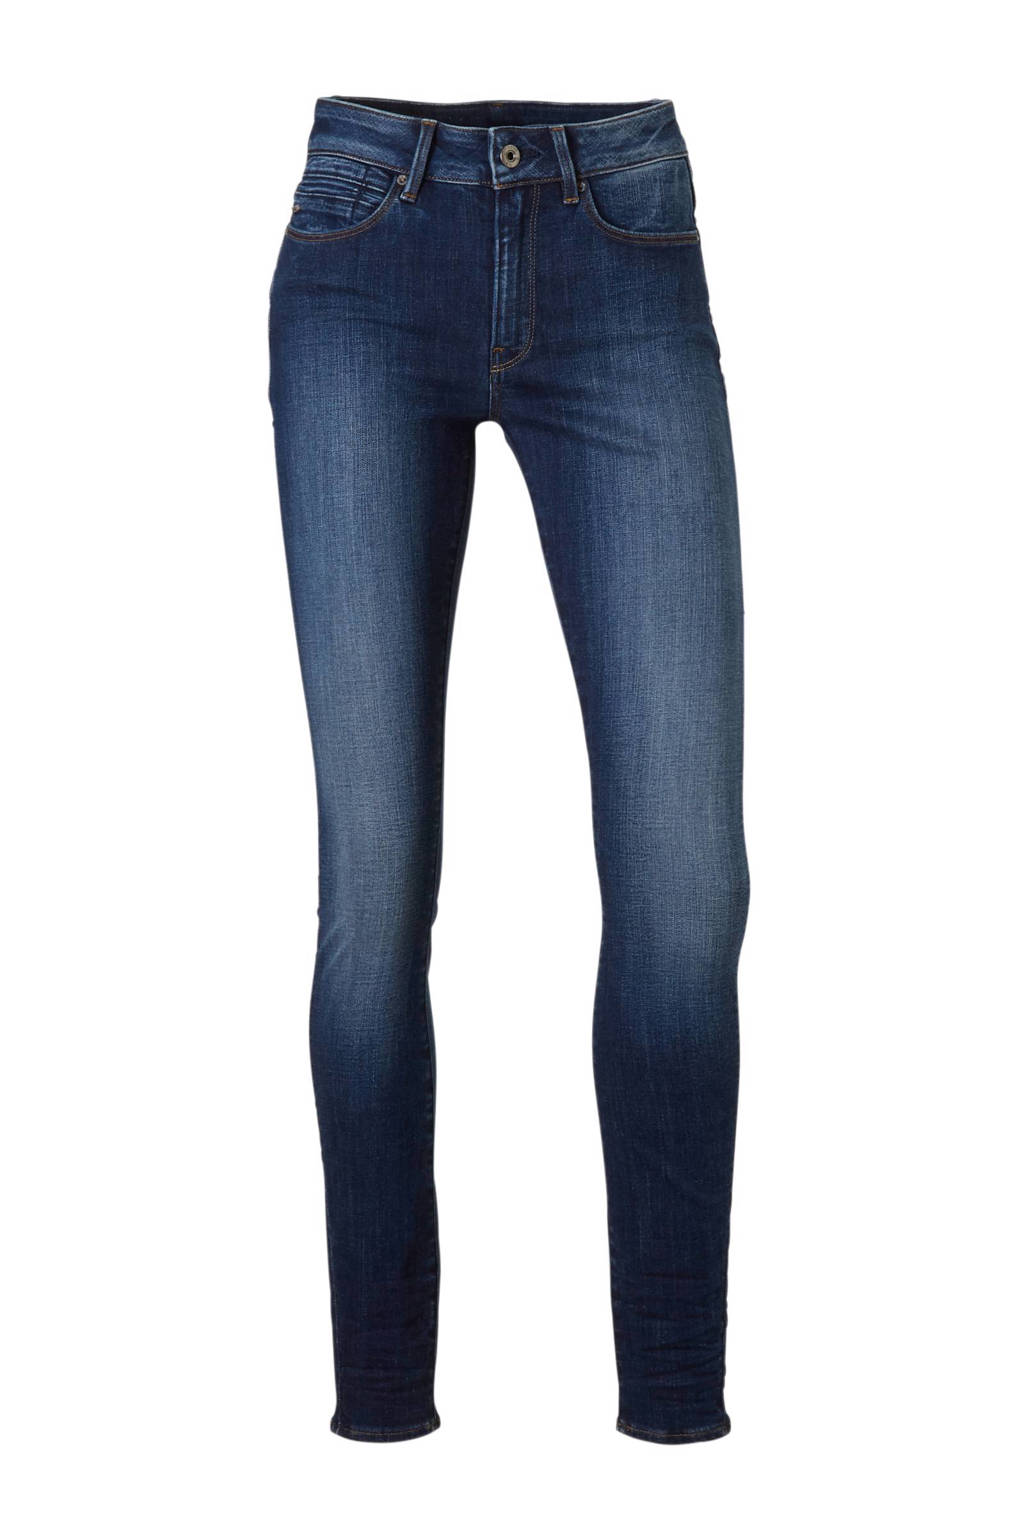 G-Star RAW Shape high super skinny fit jeans, Blauw